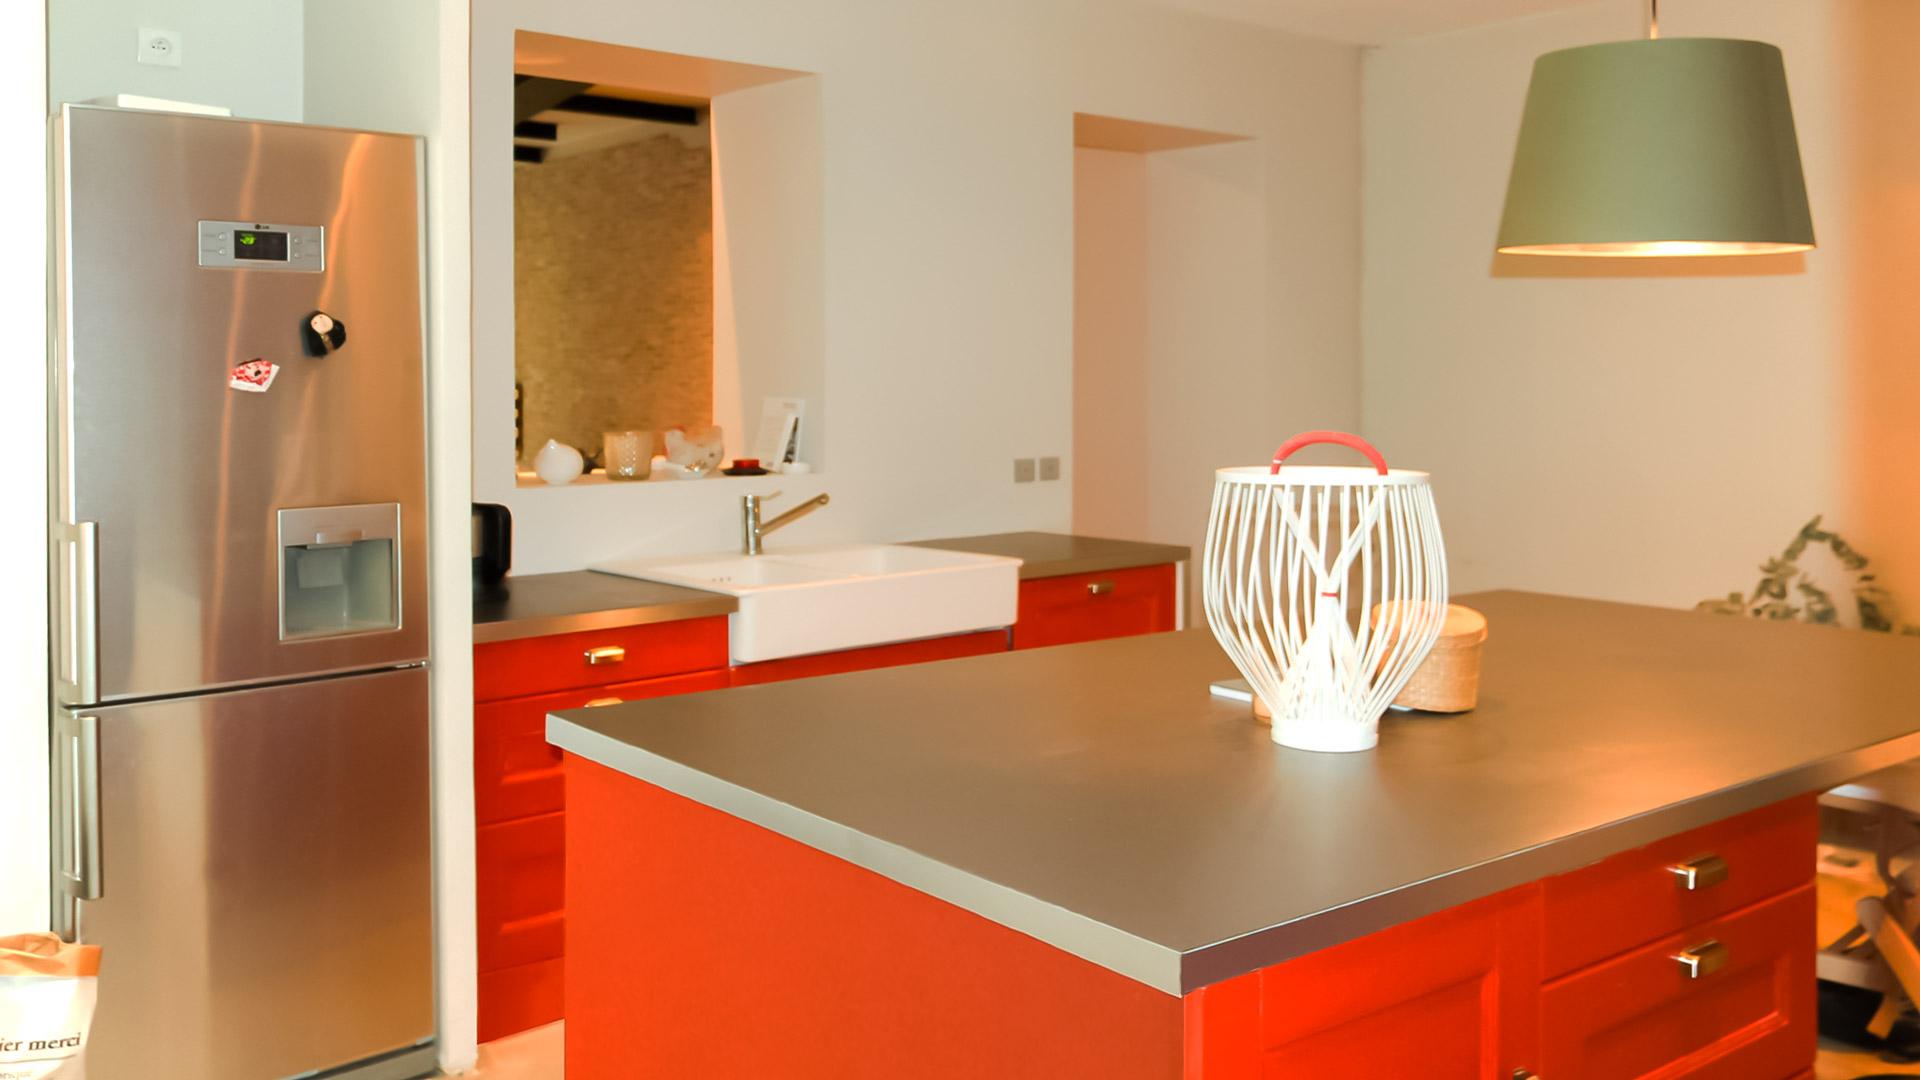 Appartement rue marcadet julie delacommune for Ilot central inox cuisine